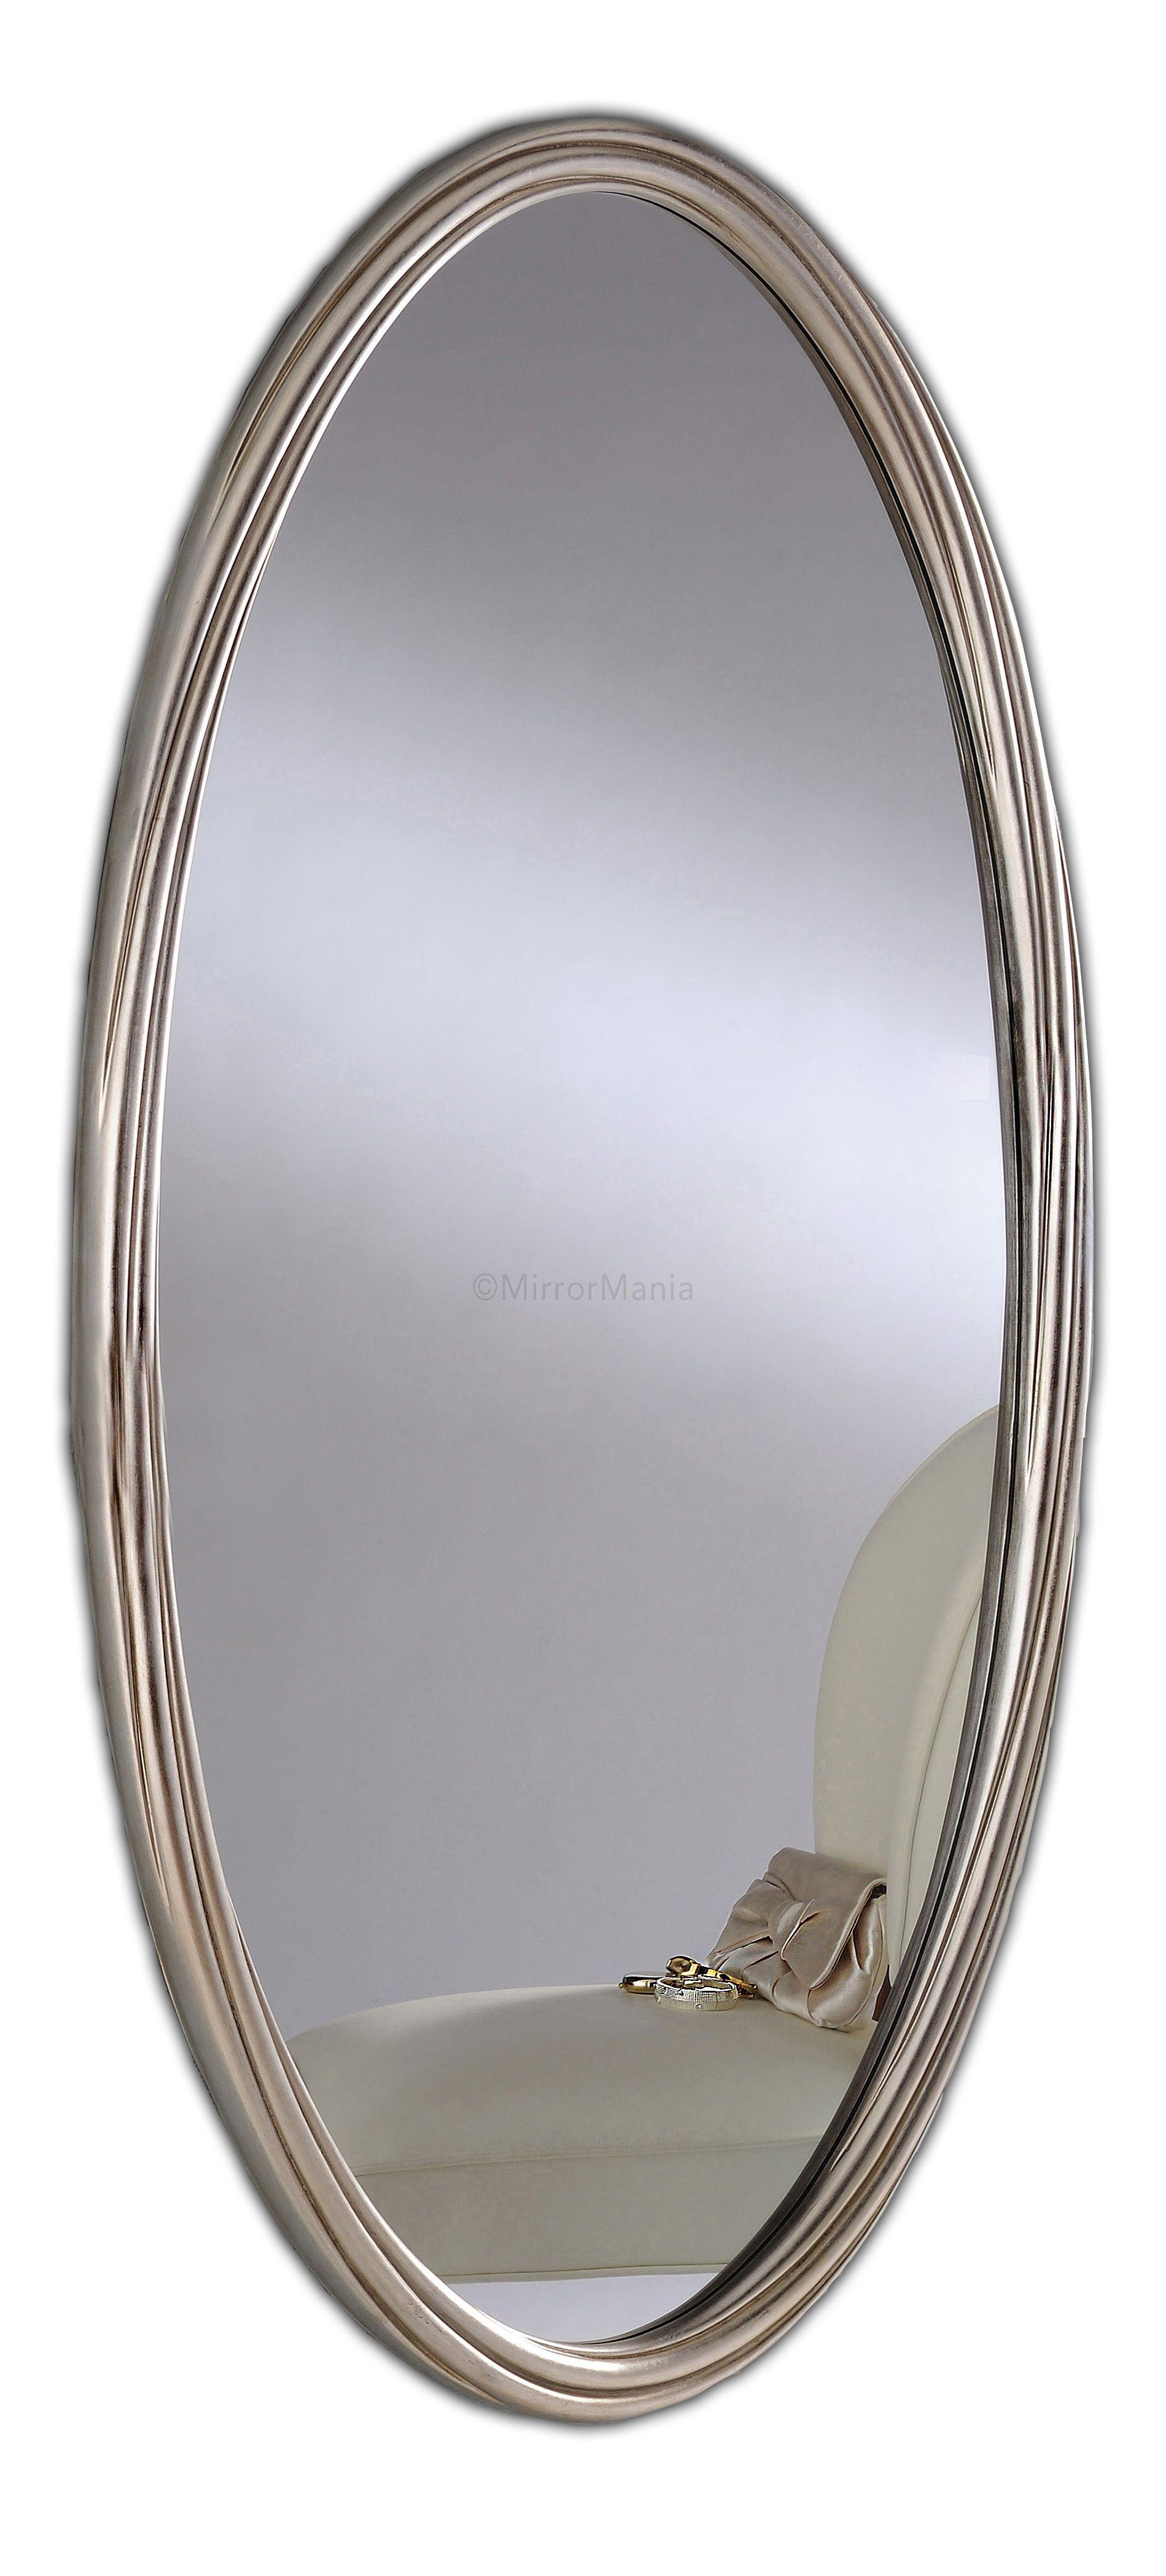 Home Decor Bespoke Mirrors Art Deco Mirrors Custom Made Mirrors Oval Mirror Mirror Art Deco Mirror